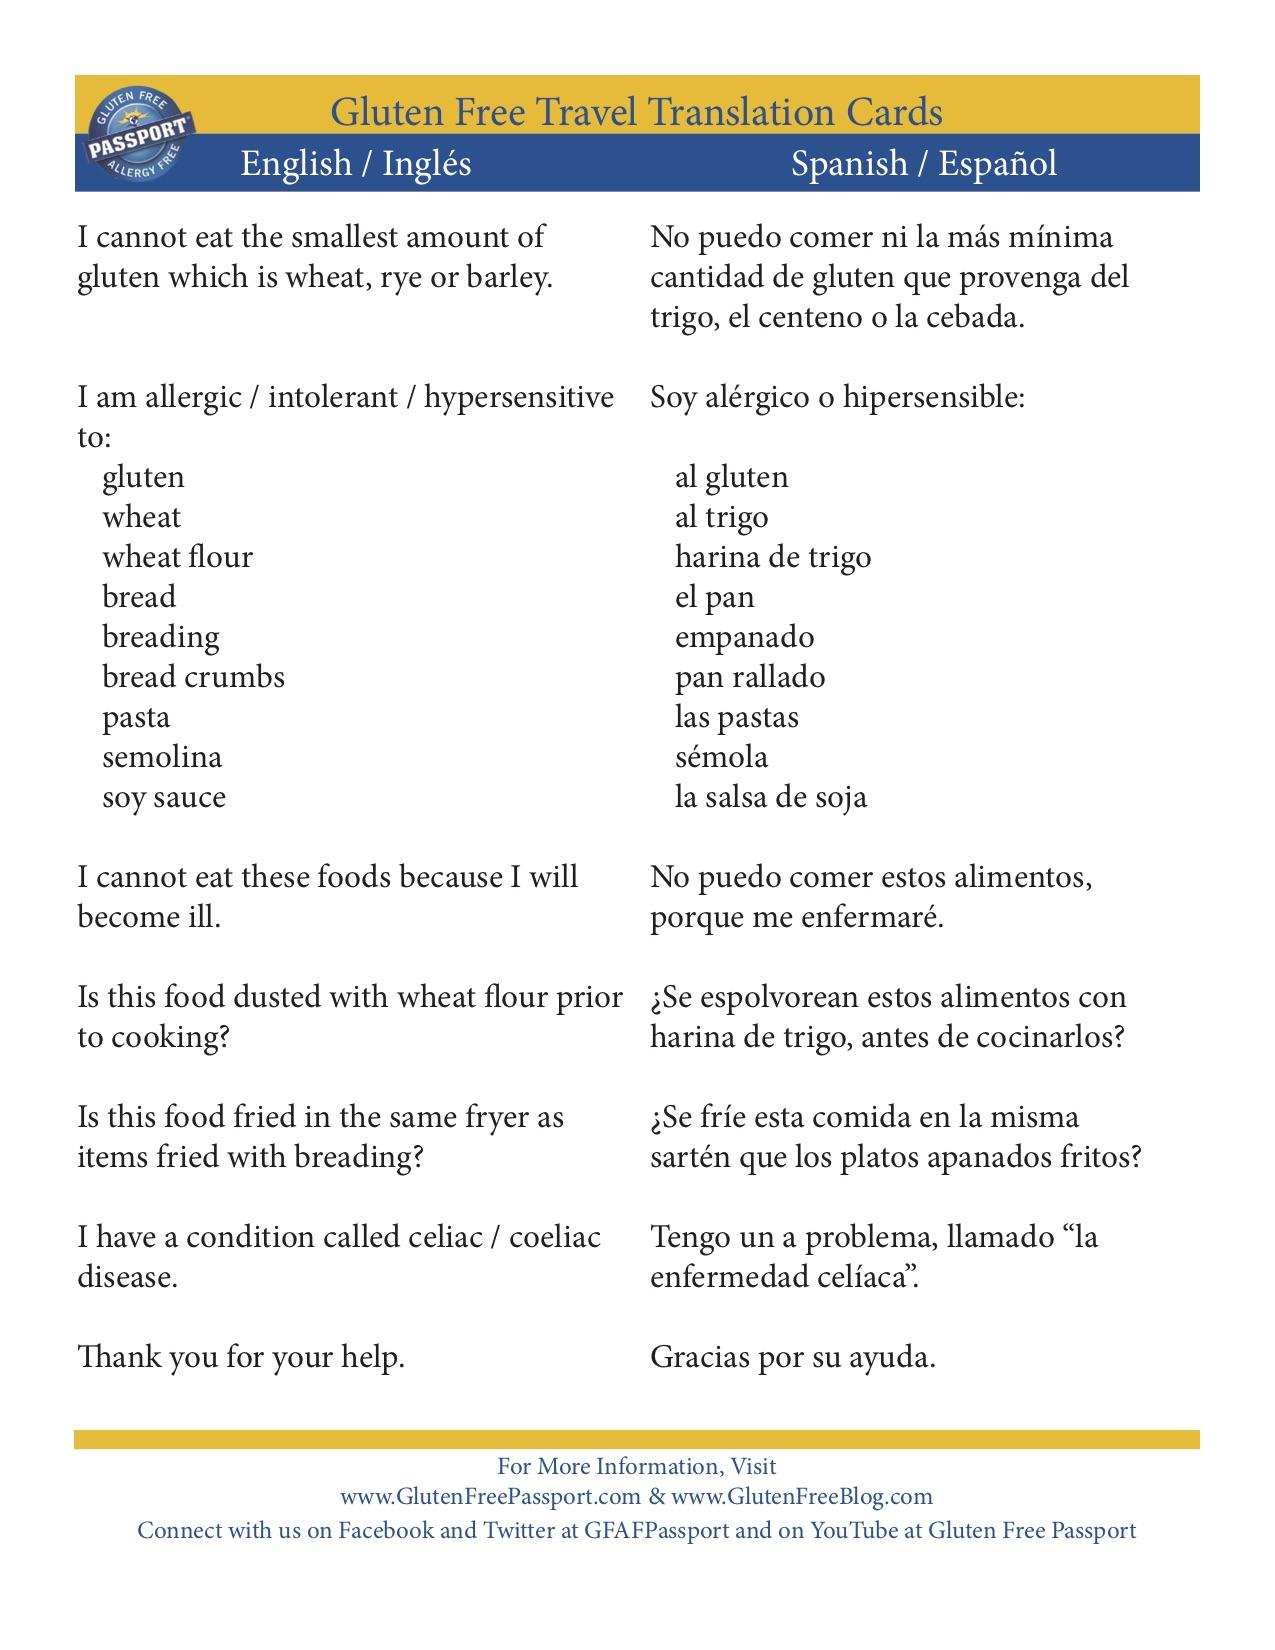 English / Spanish translation card for gluten free ordering in restaurants.